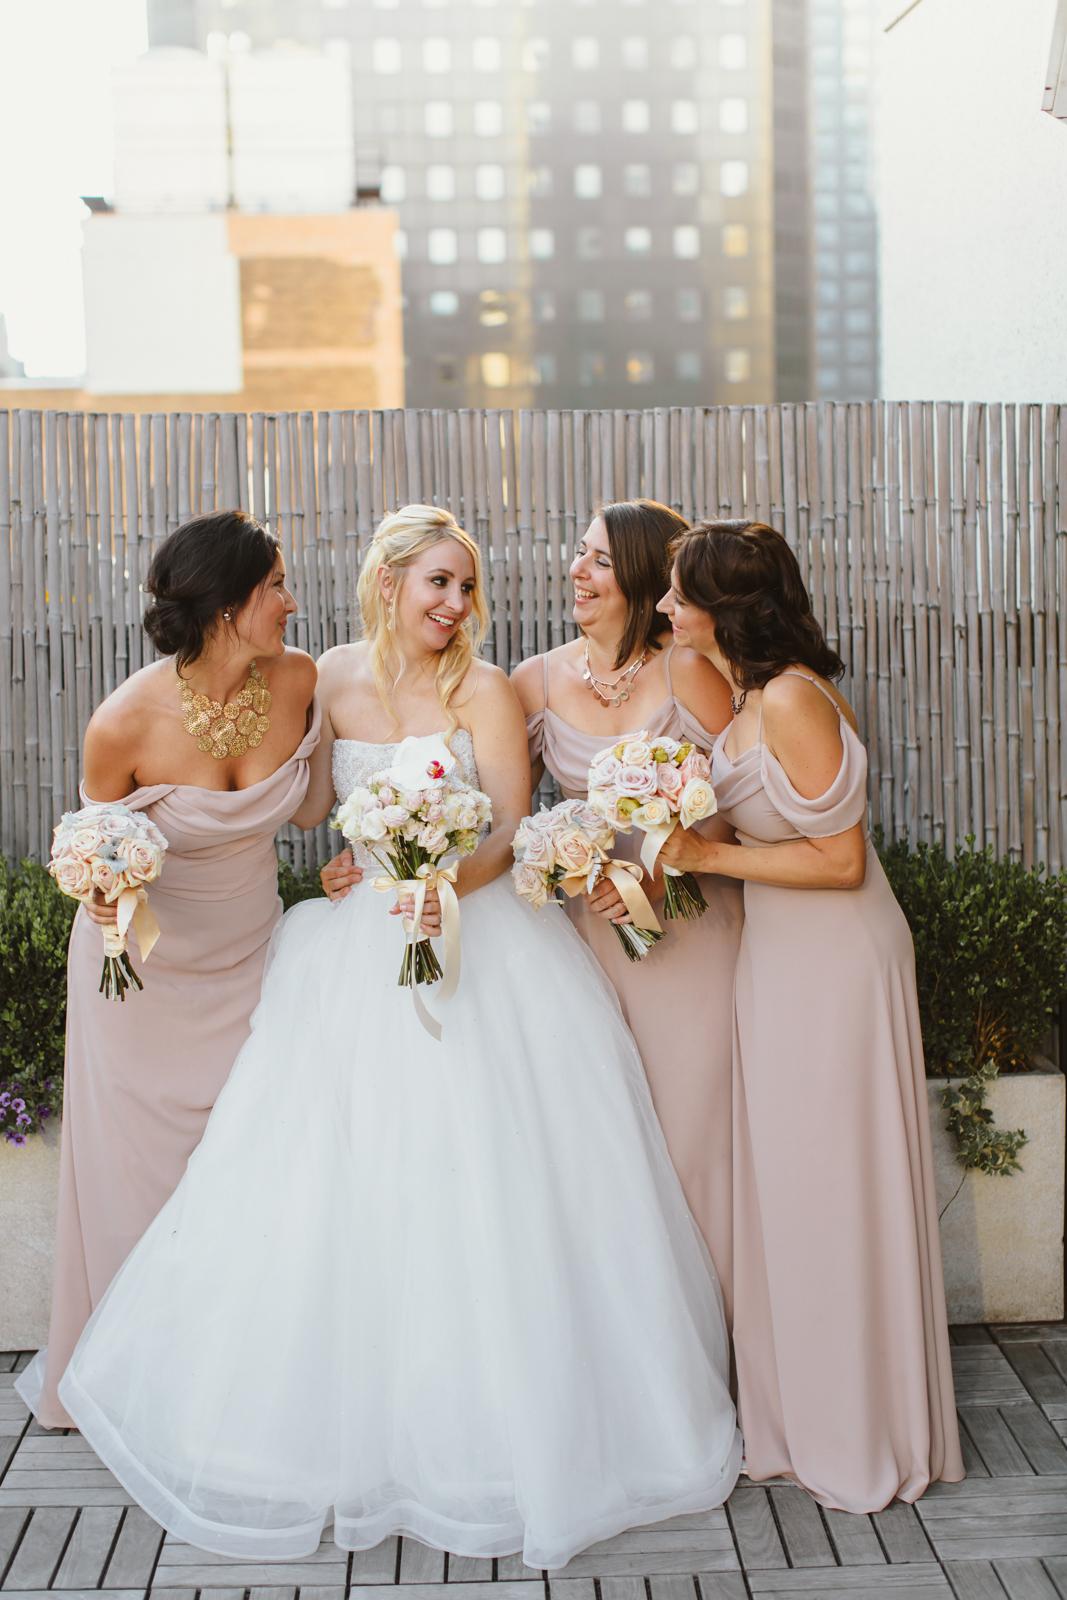 NYC Wedding Photography Sofitel Central Park Brooklyn Photographer Boris Zaretsky _B2C2786.jpg